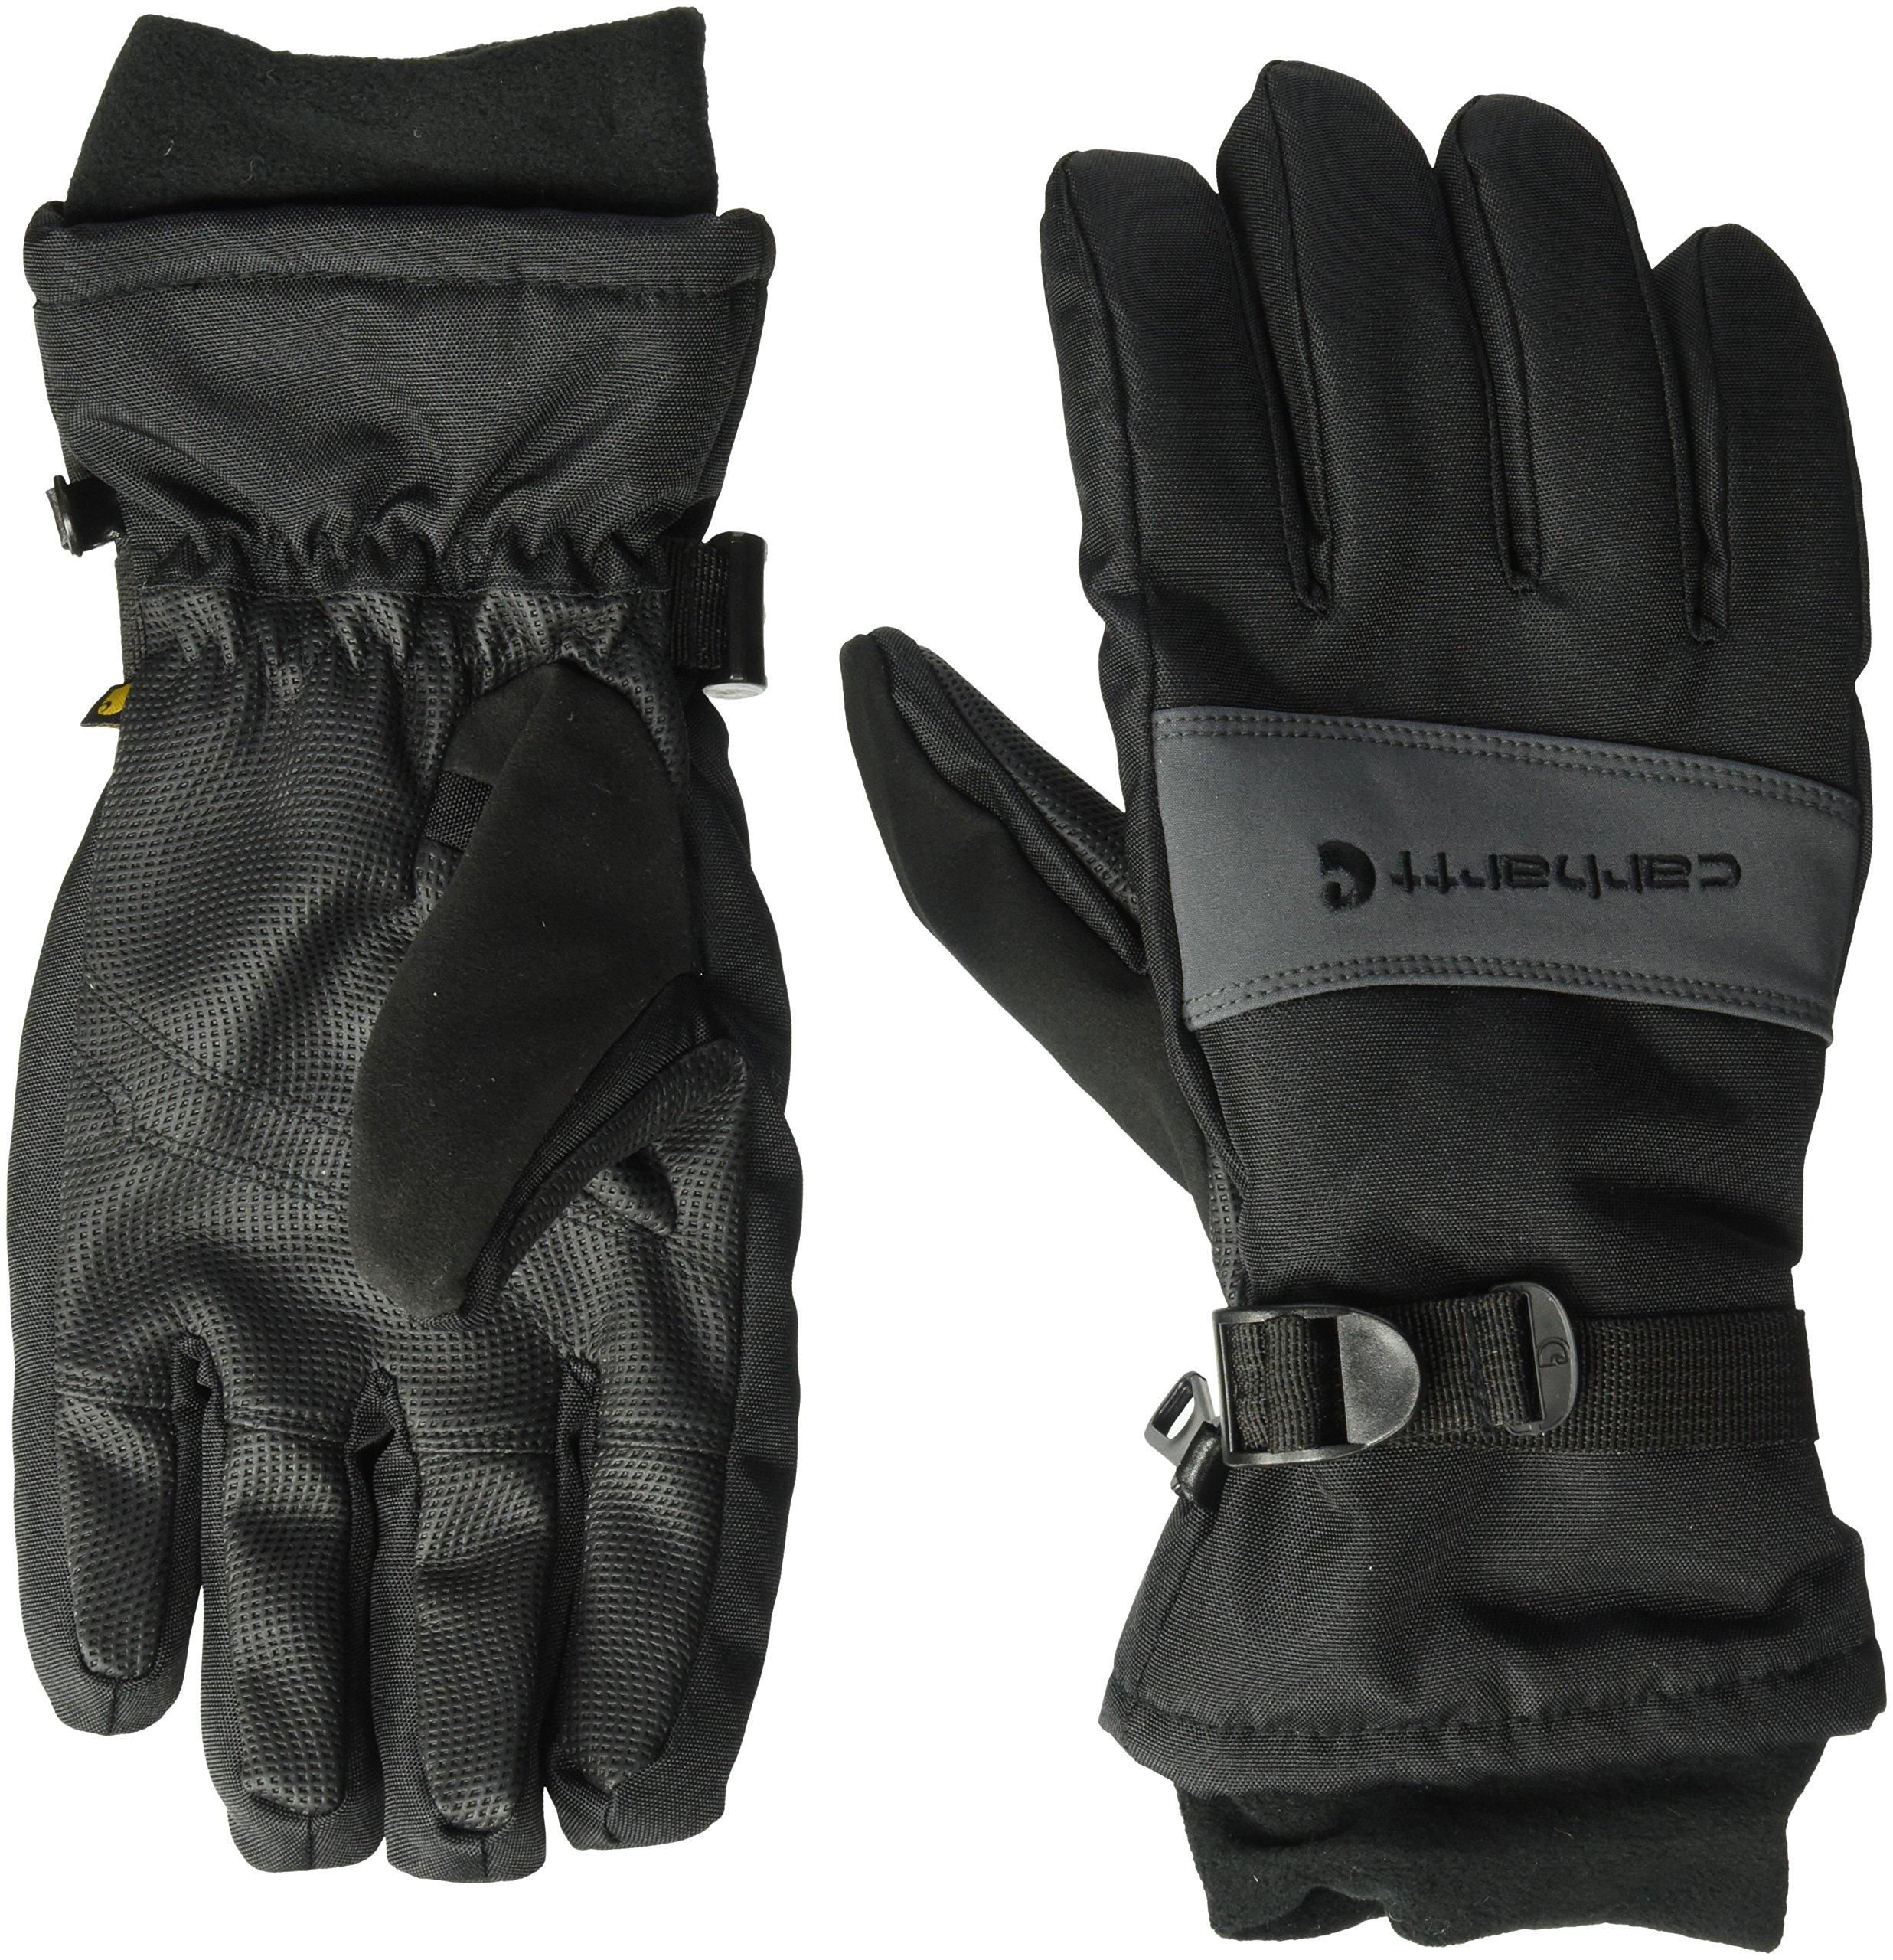 Carhartt Men's W.p. Waterproof Insulated Work Glove, black/Grey, Medium